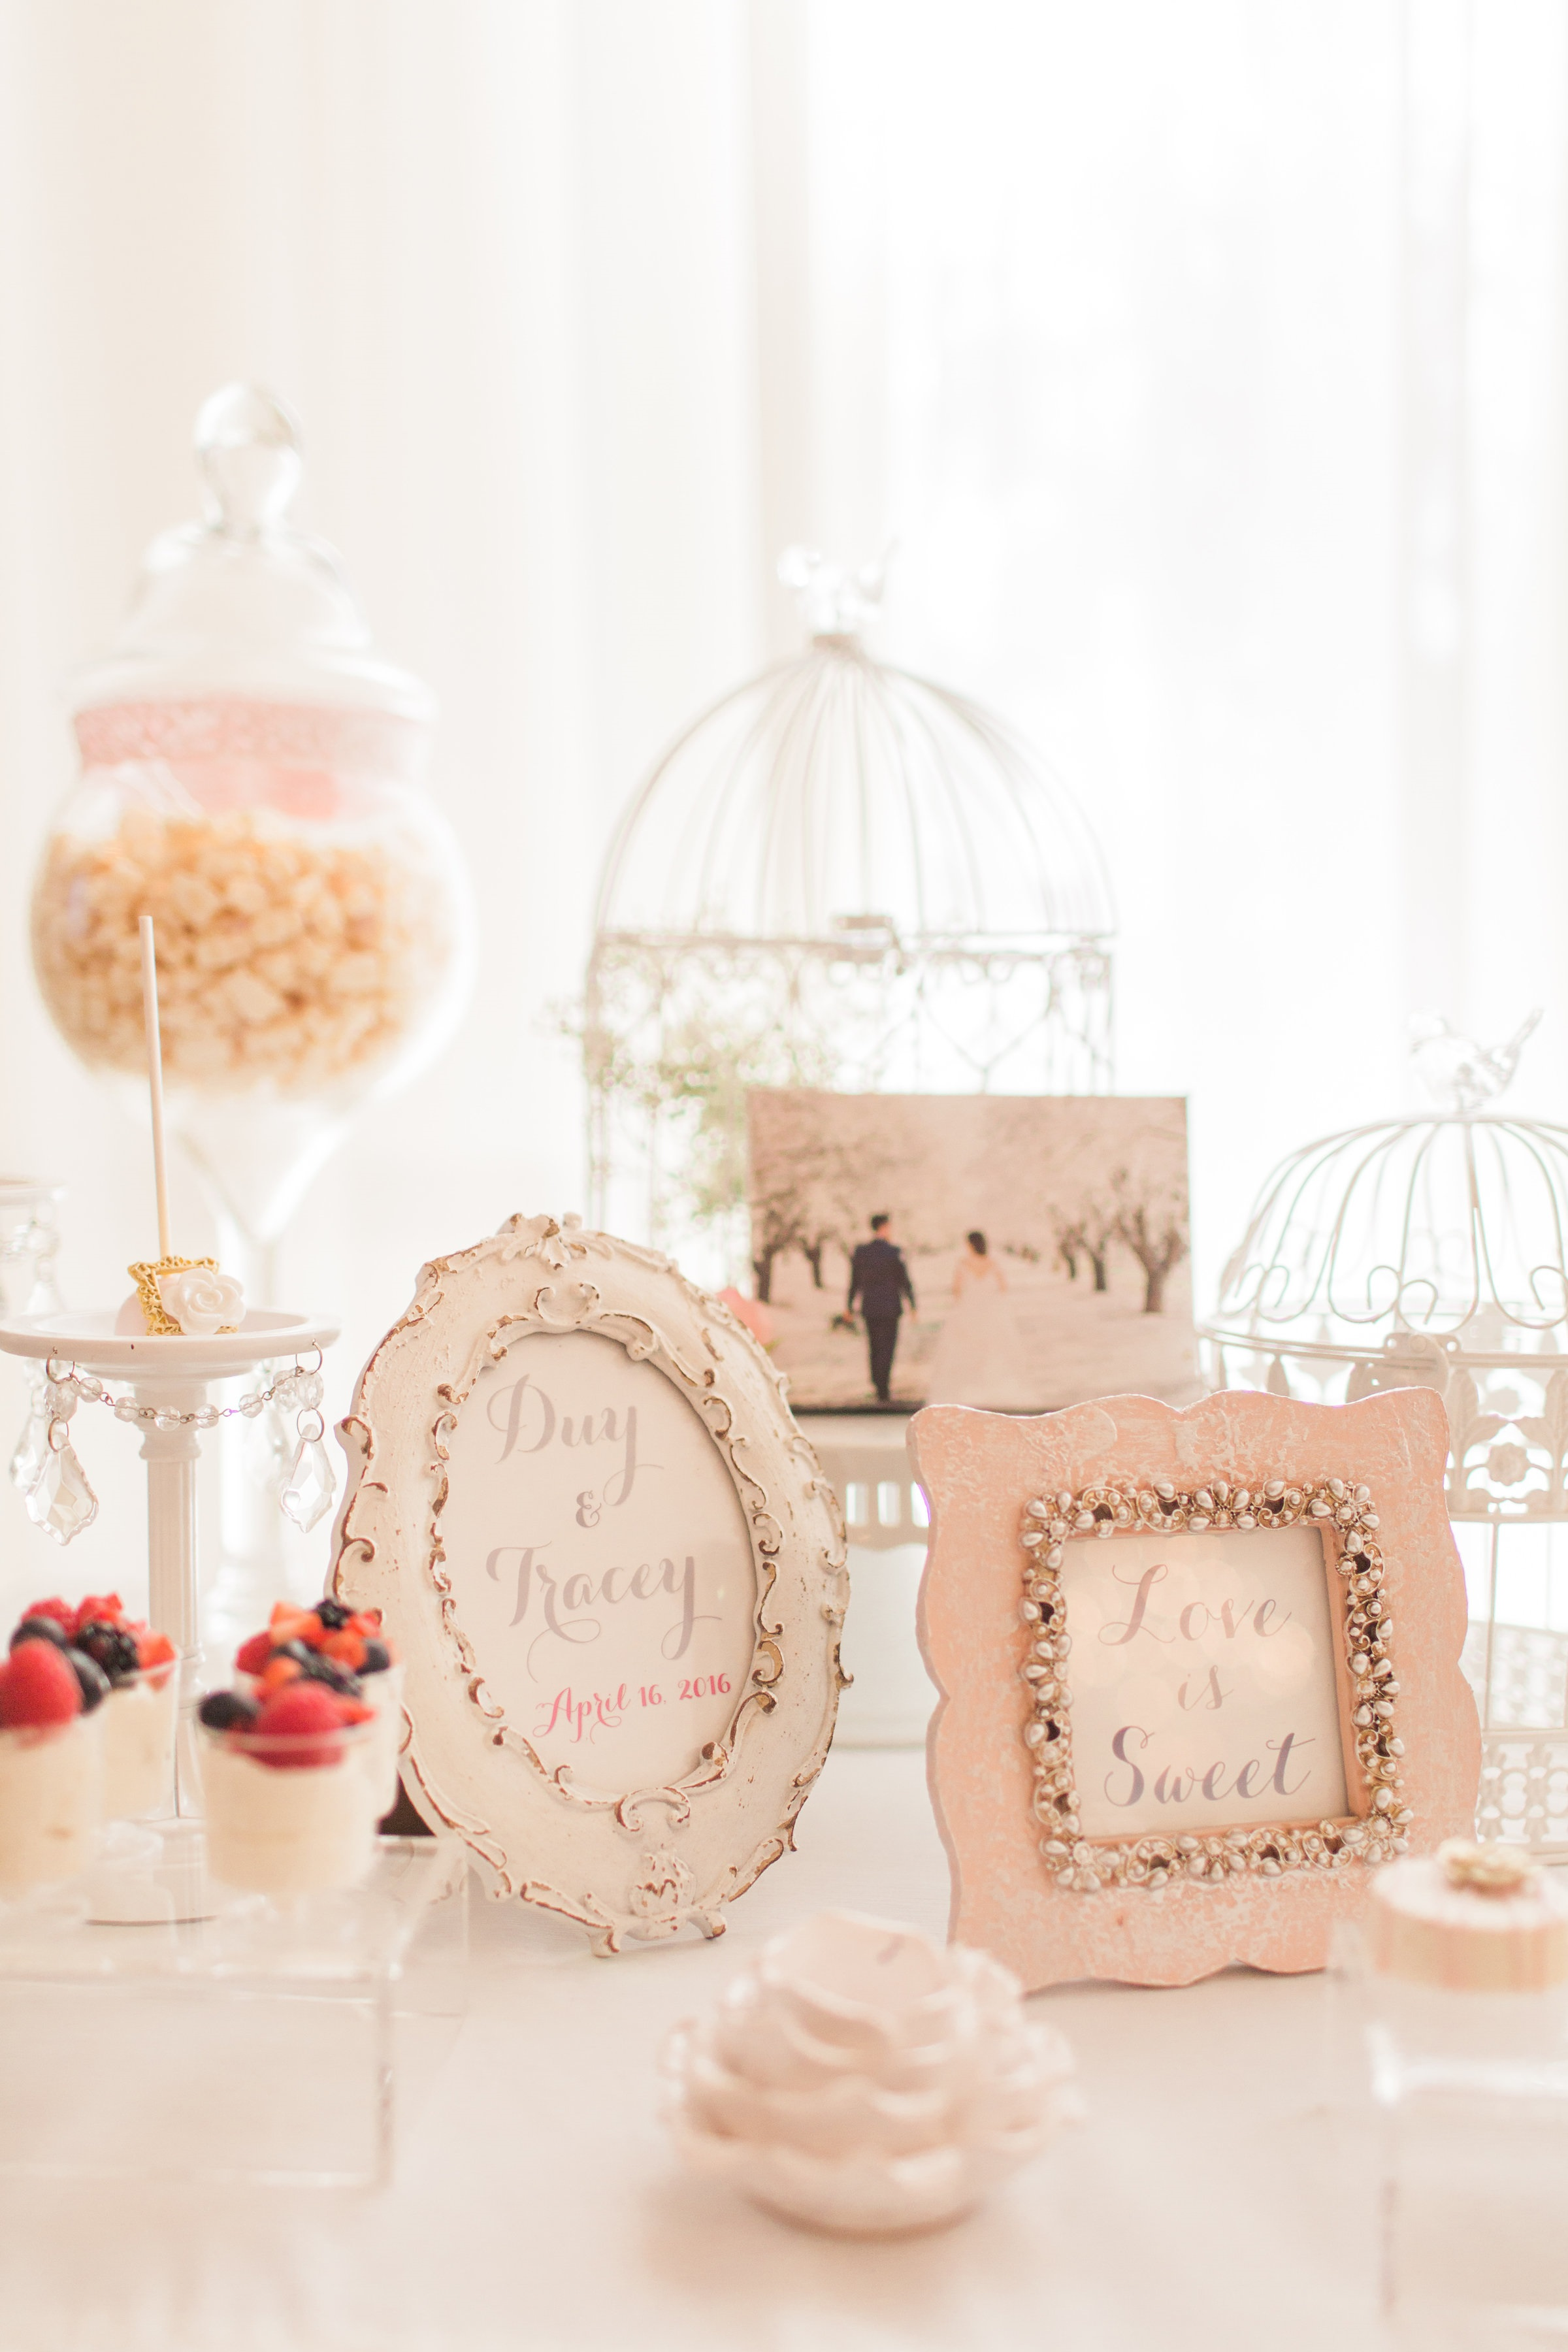 tracey-duy-wedding-821.jpg